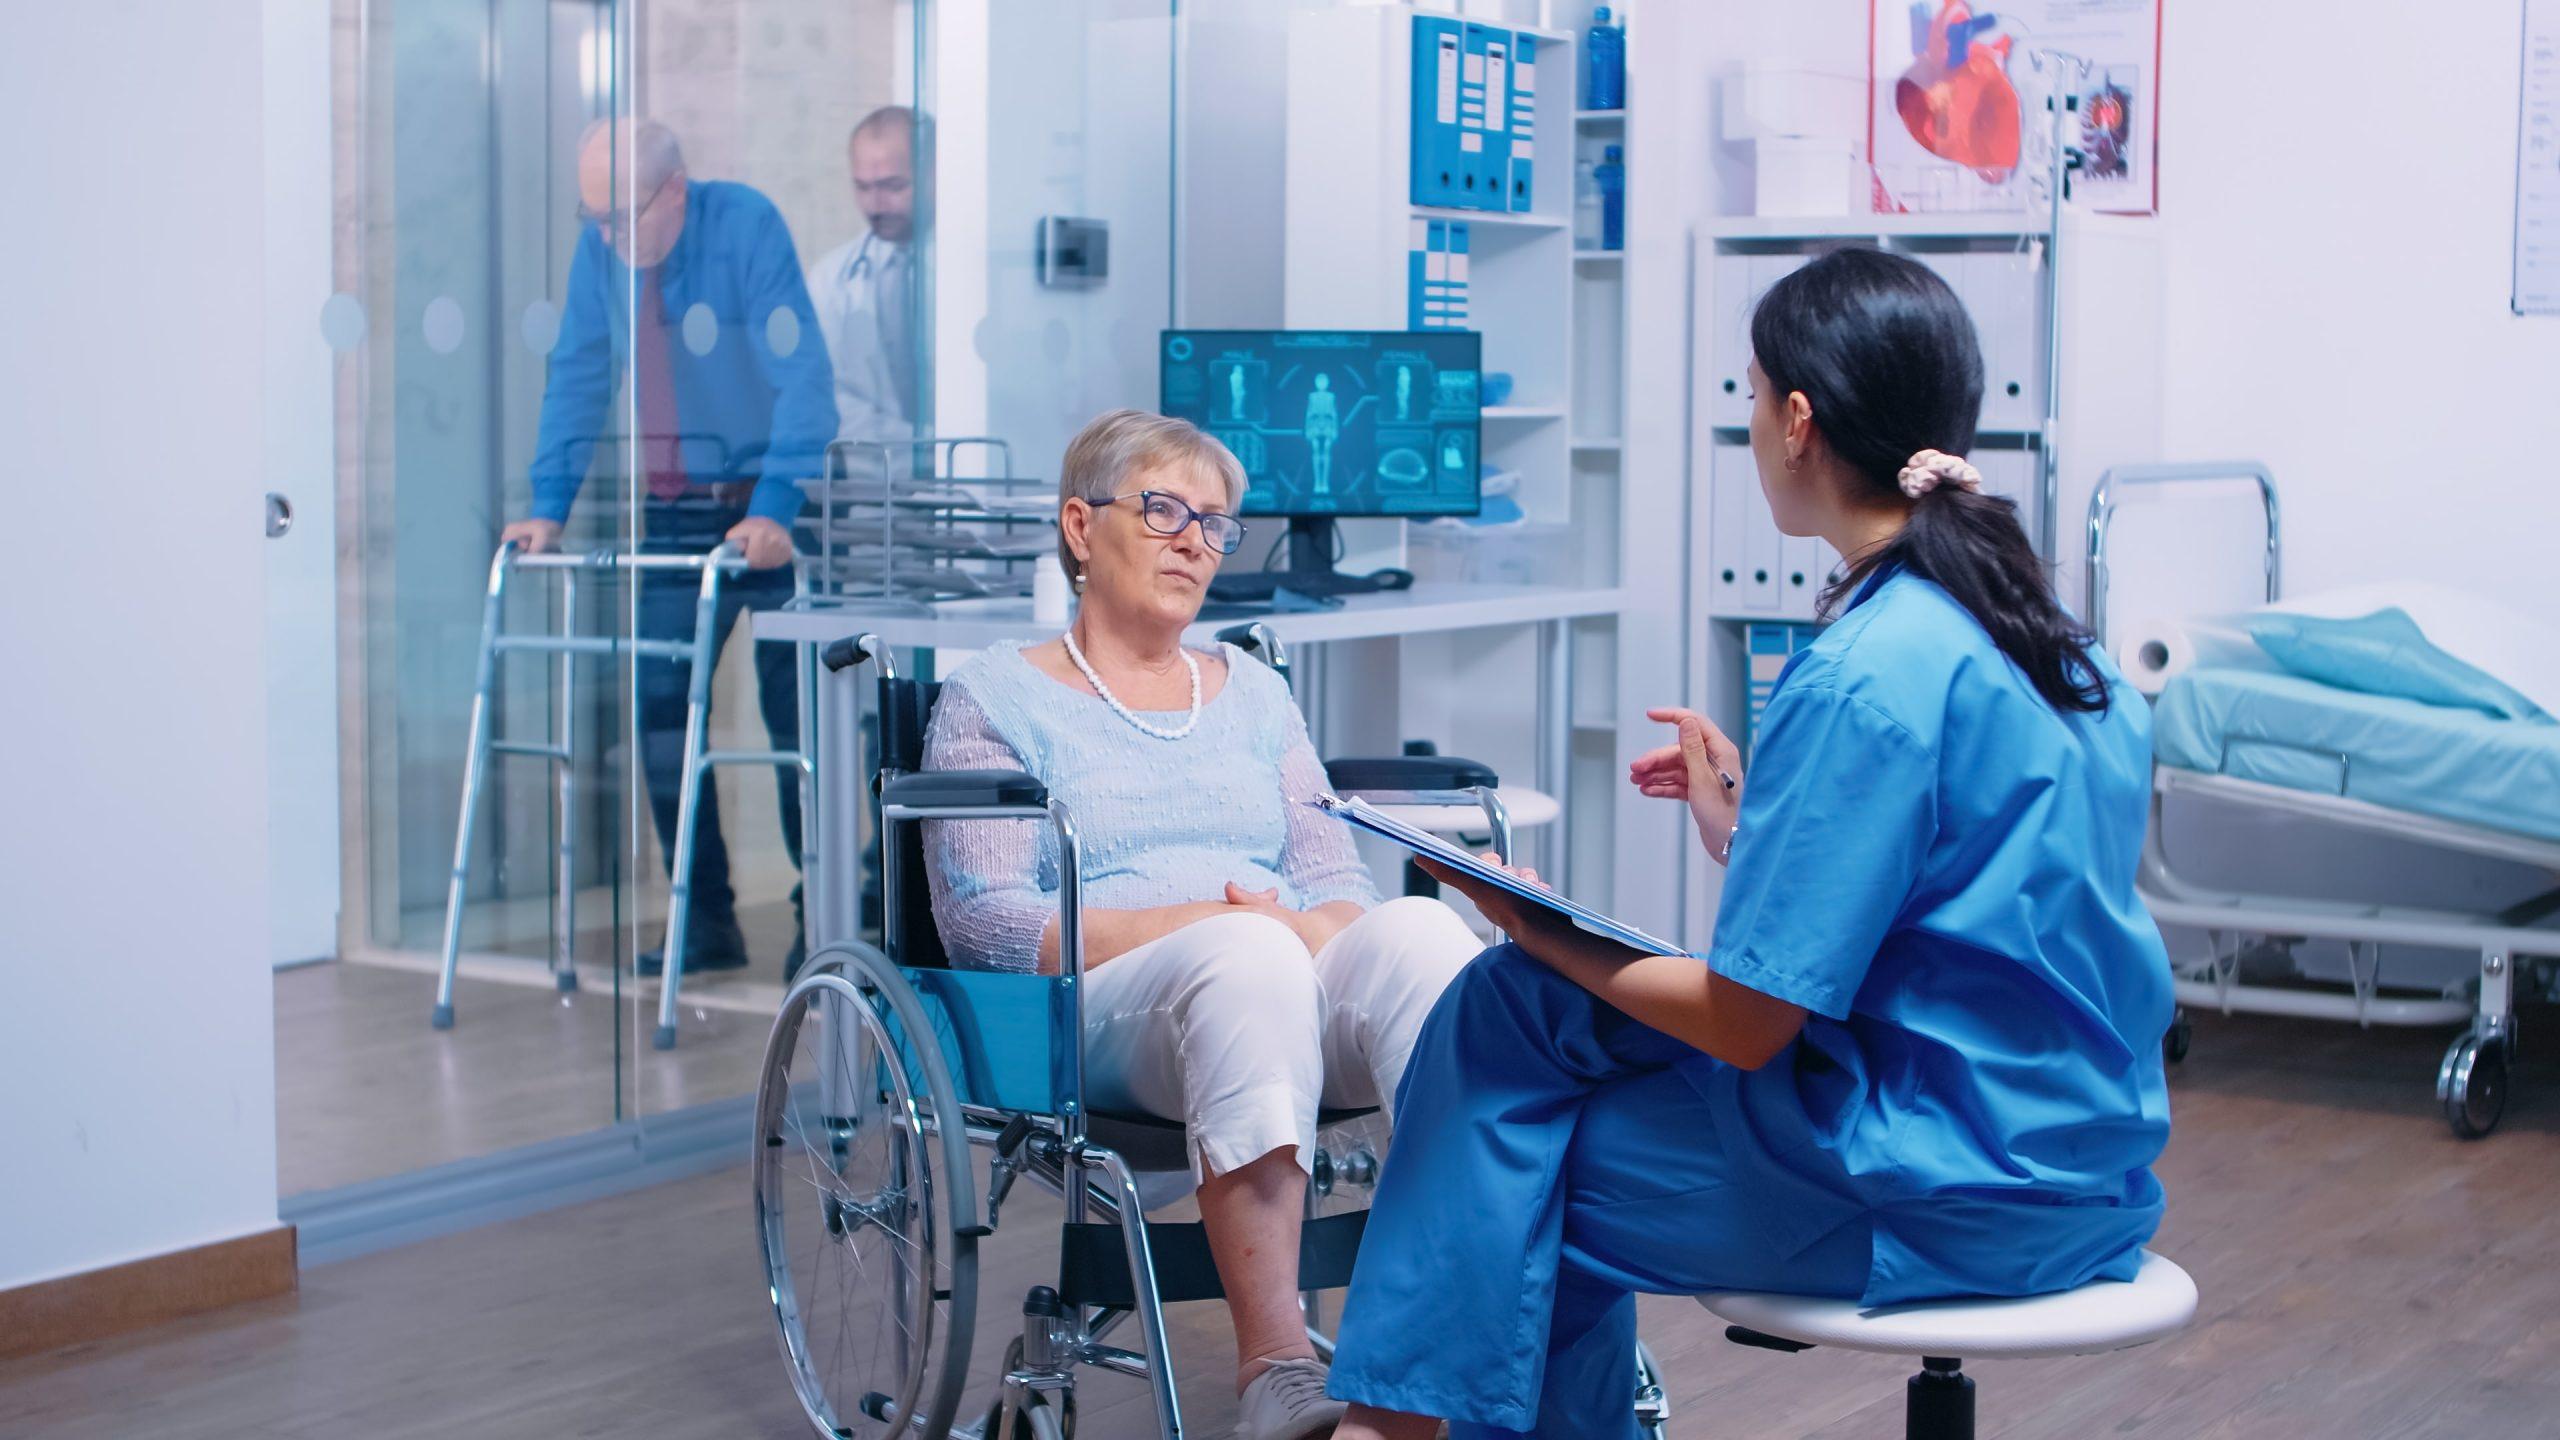 Критерии инвалидности в Израиле – кому положено пособие по инвалидности